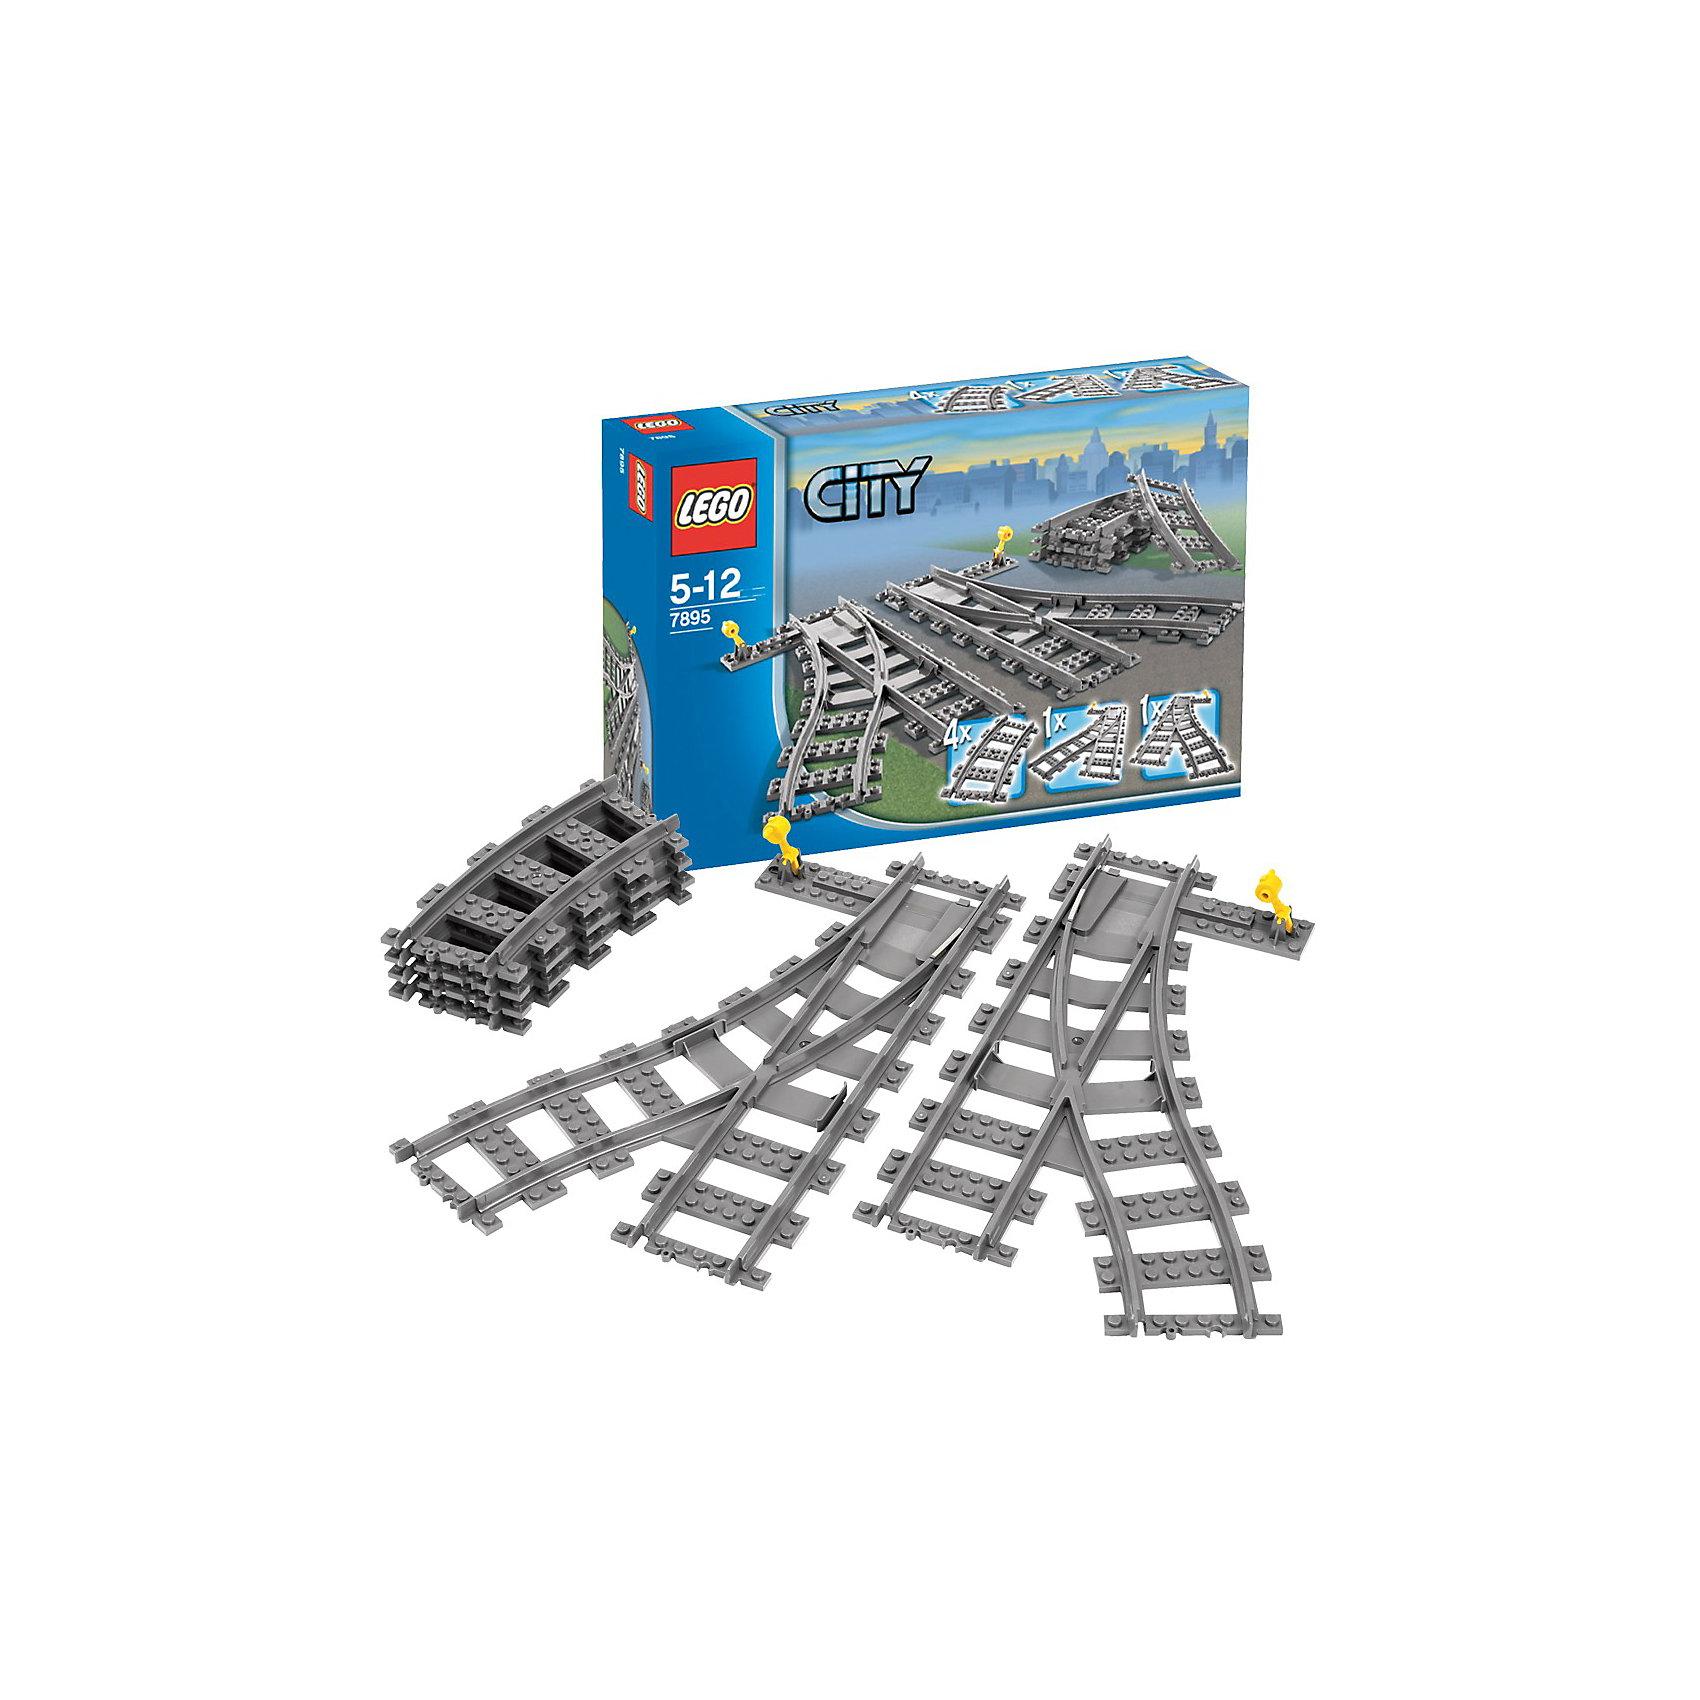 LEGO LEGO City 7895: Набор стрелок